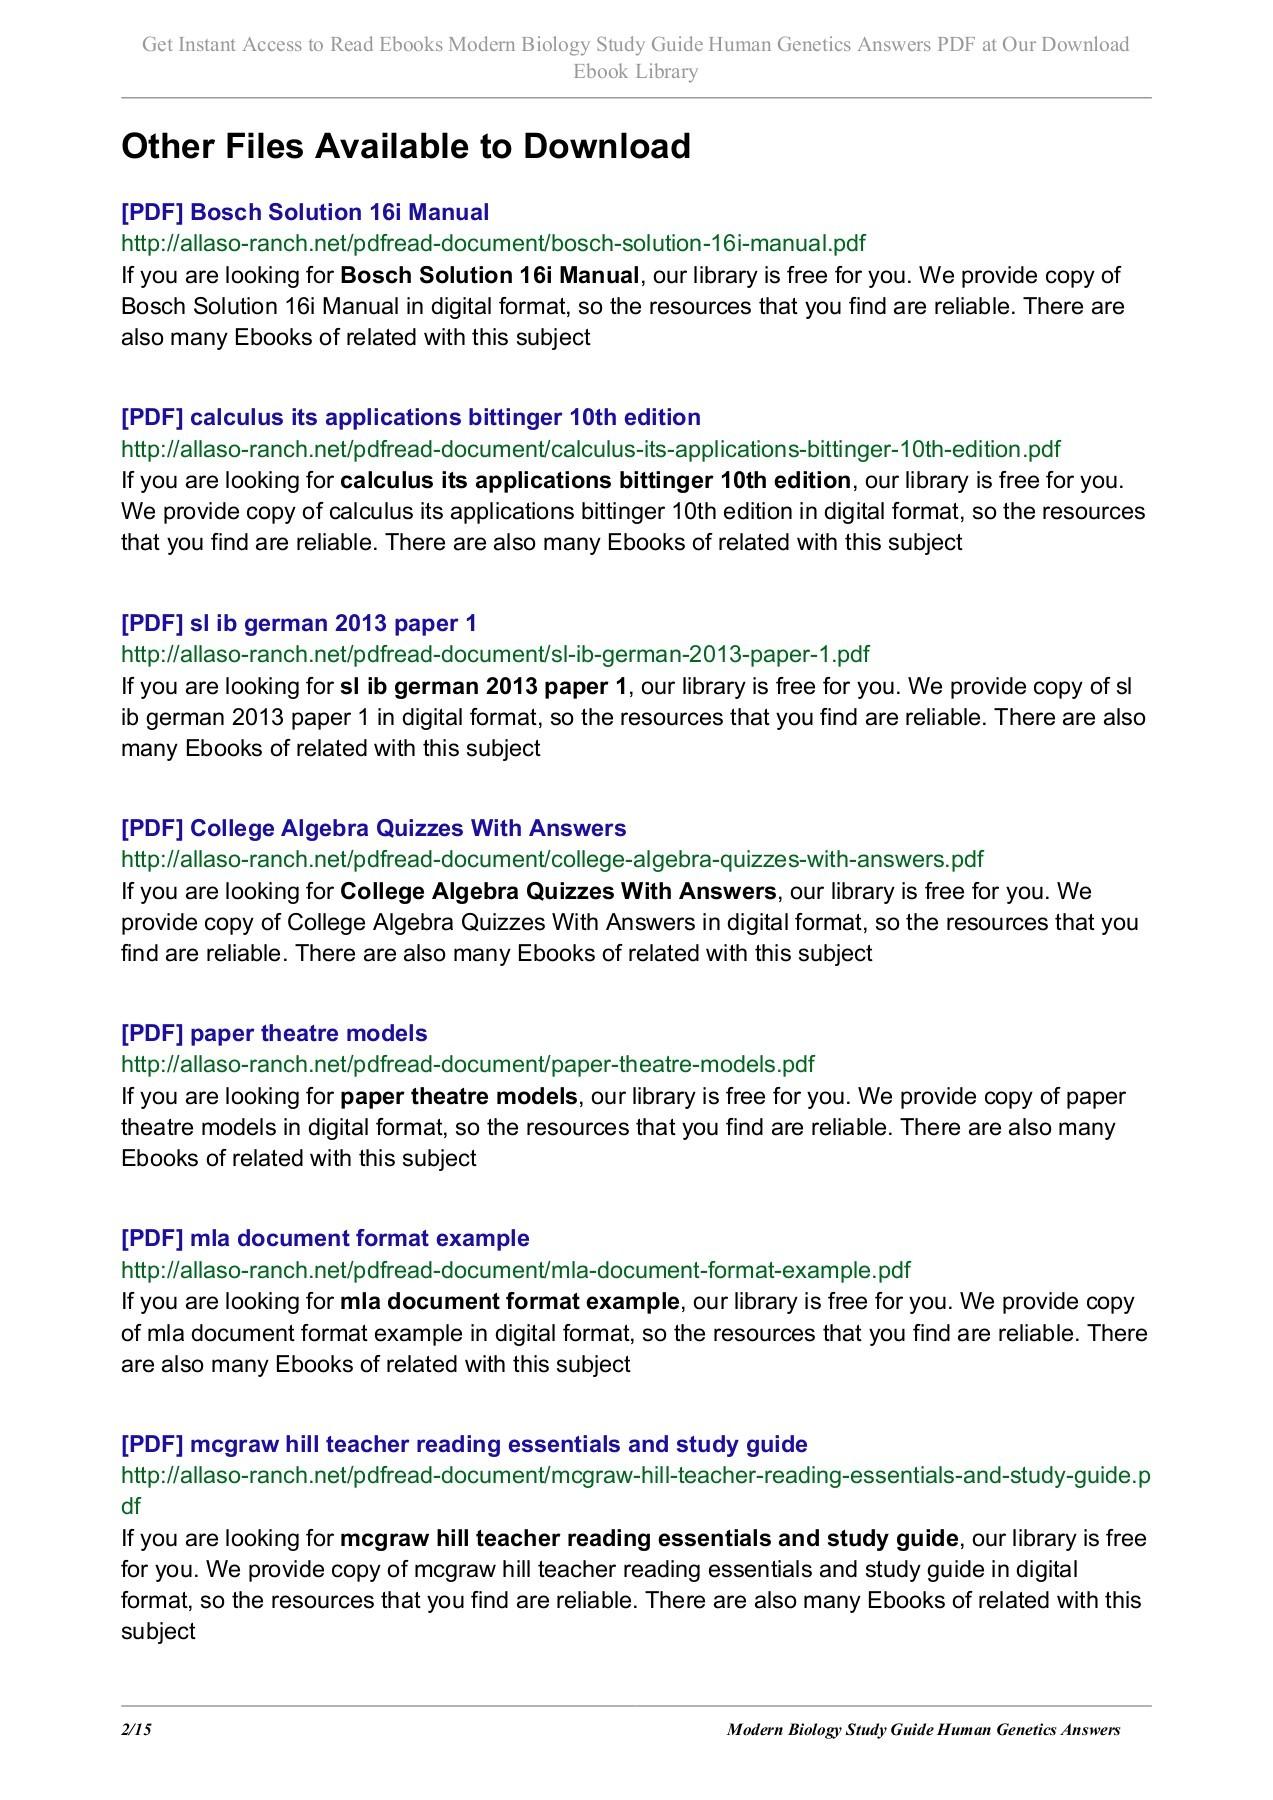 Manual C4580 Ebook Gt Publicaciones Circuitbending Build Your Own Alien Instruments Array Hitachi Nr90ae Rh Zettadata Solutions